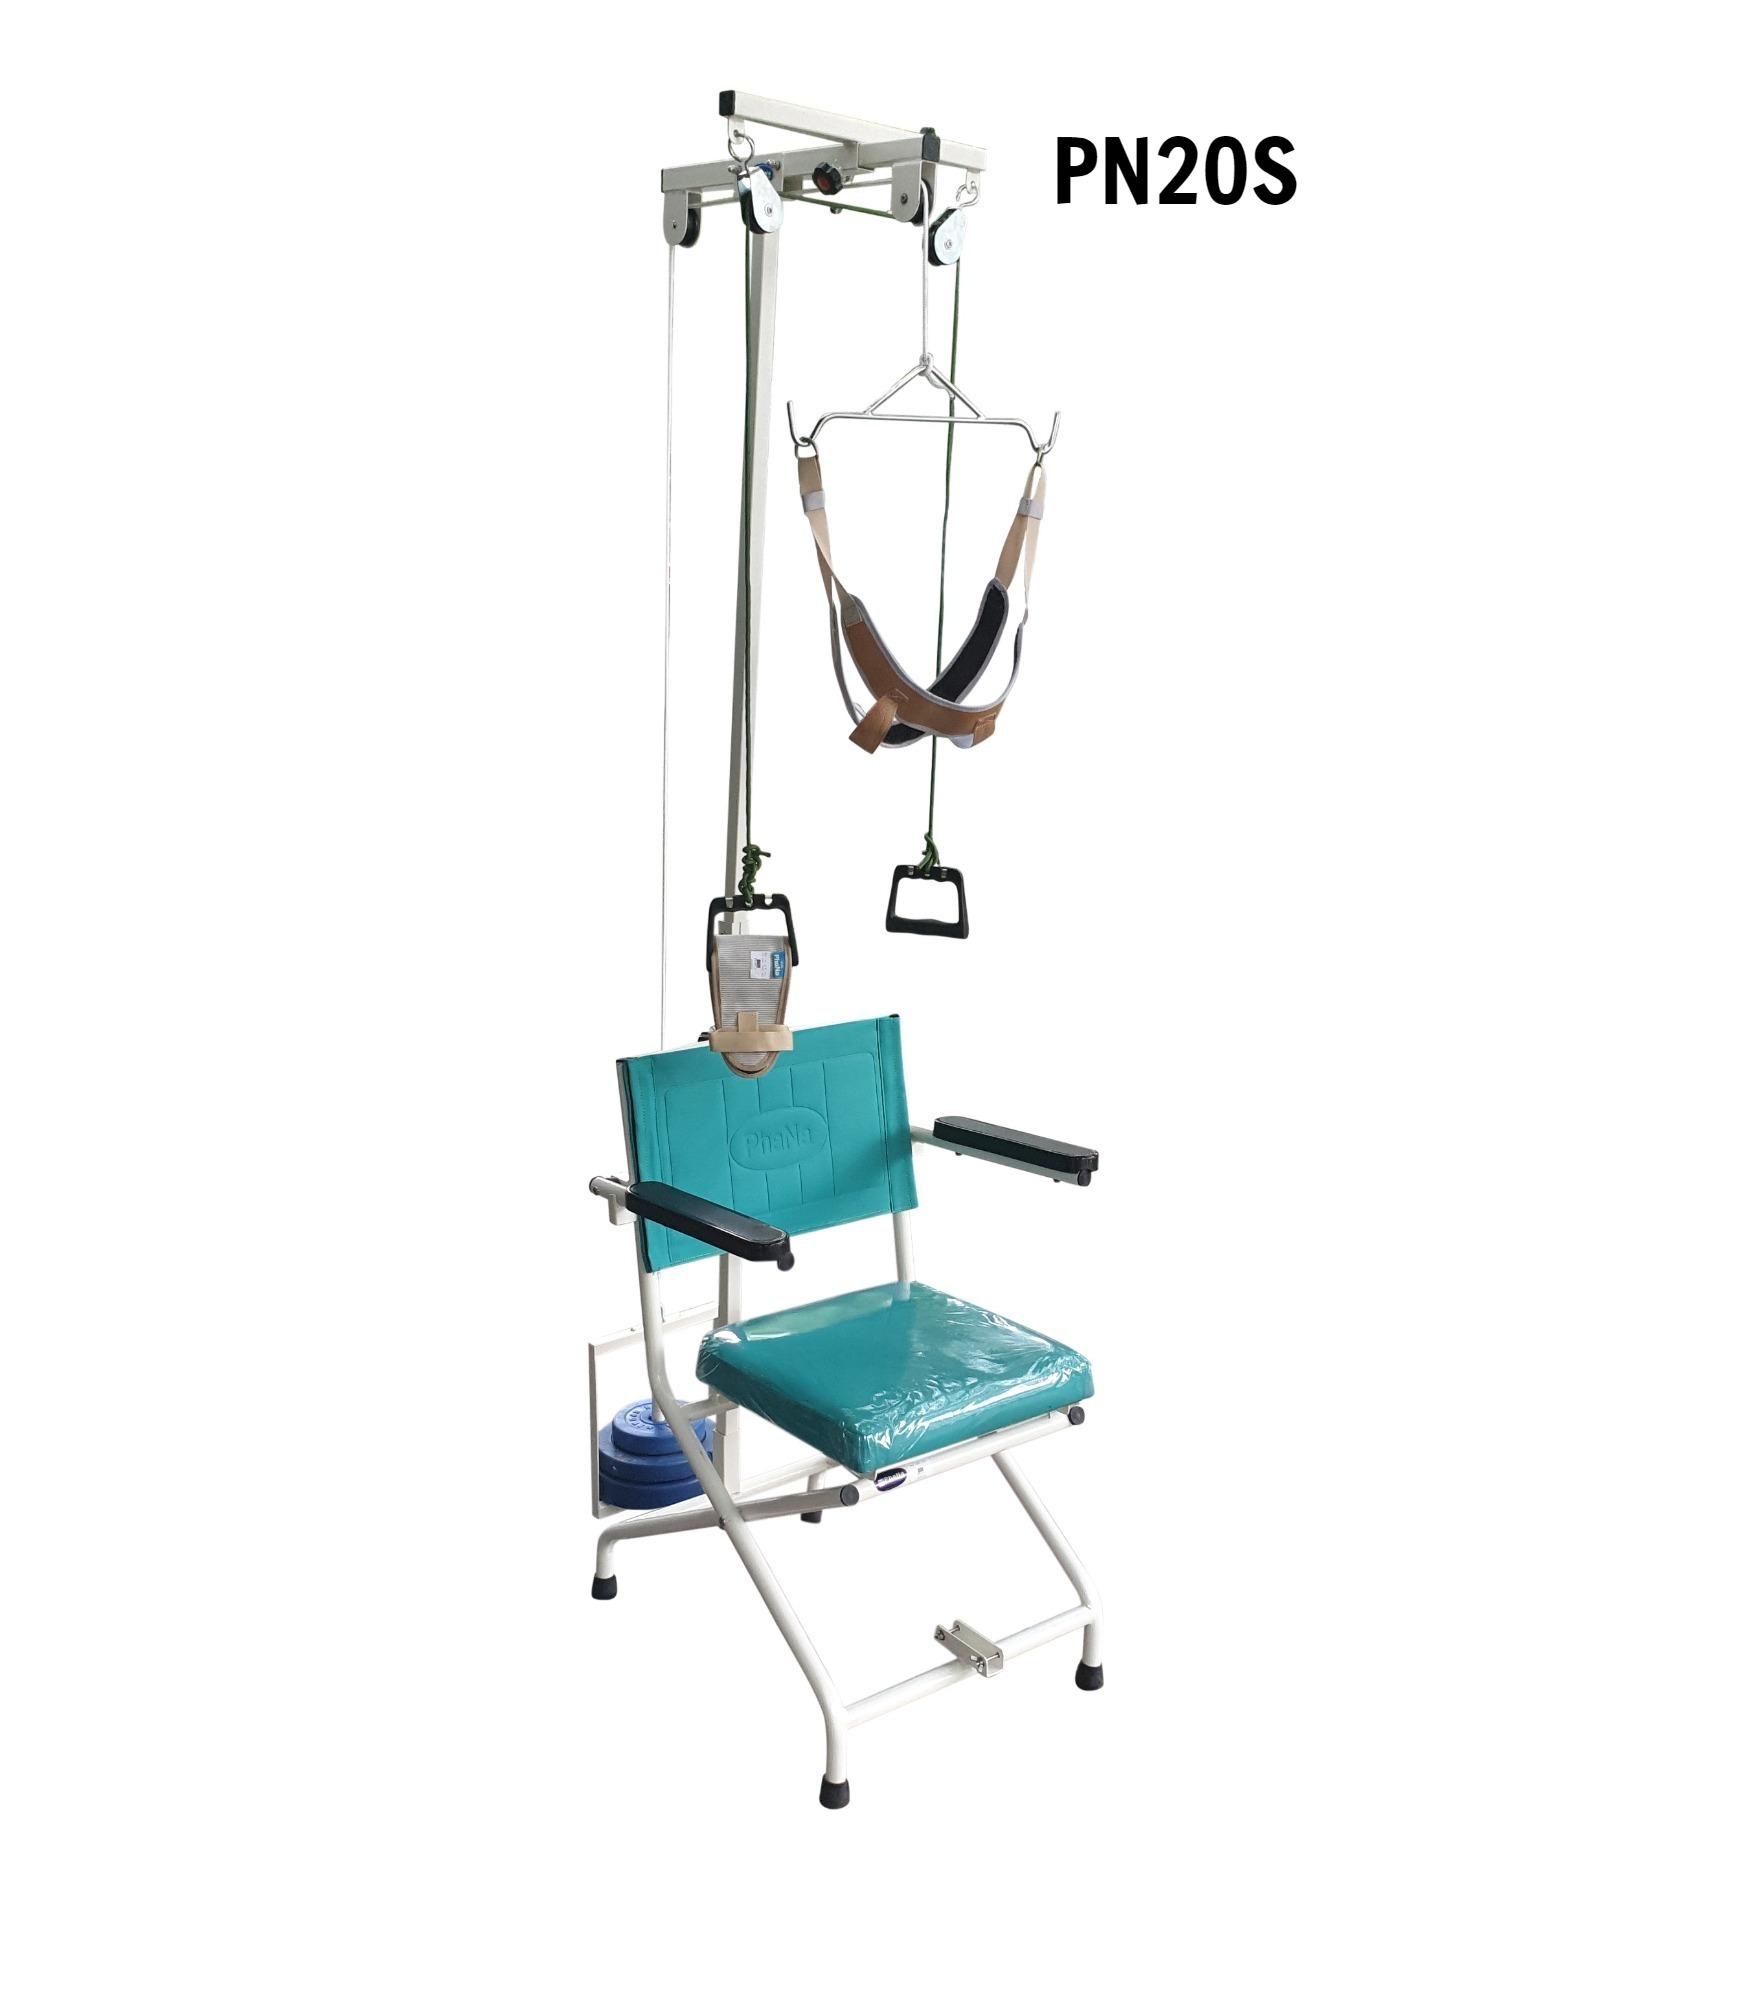 PN20S - Ghế ngồi kéo cổ - PHCN